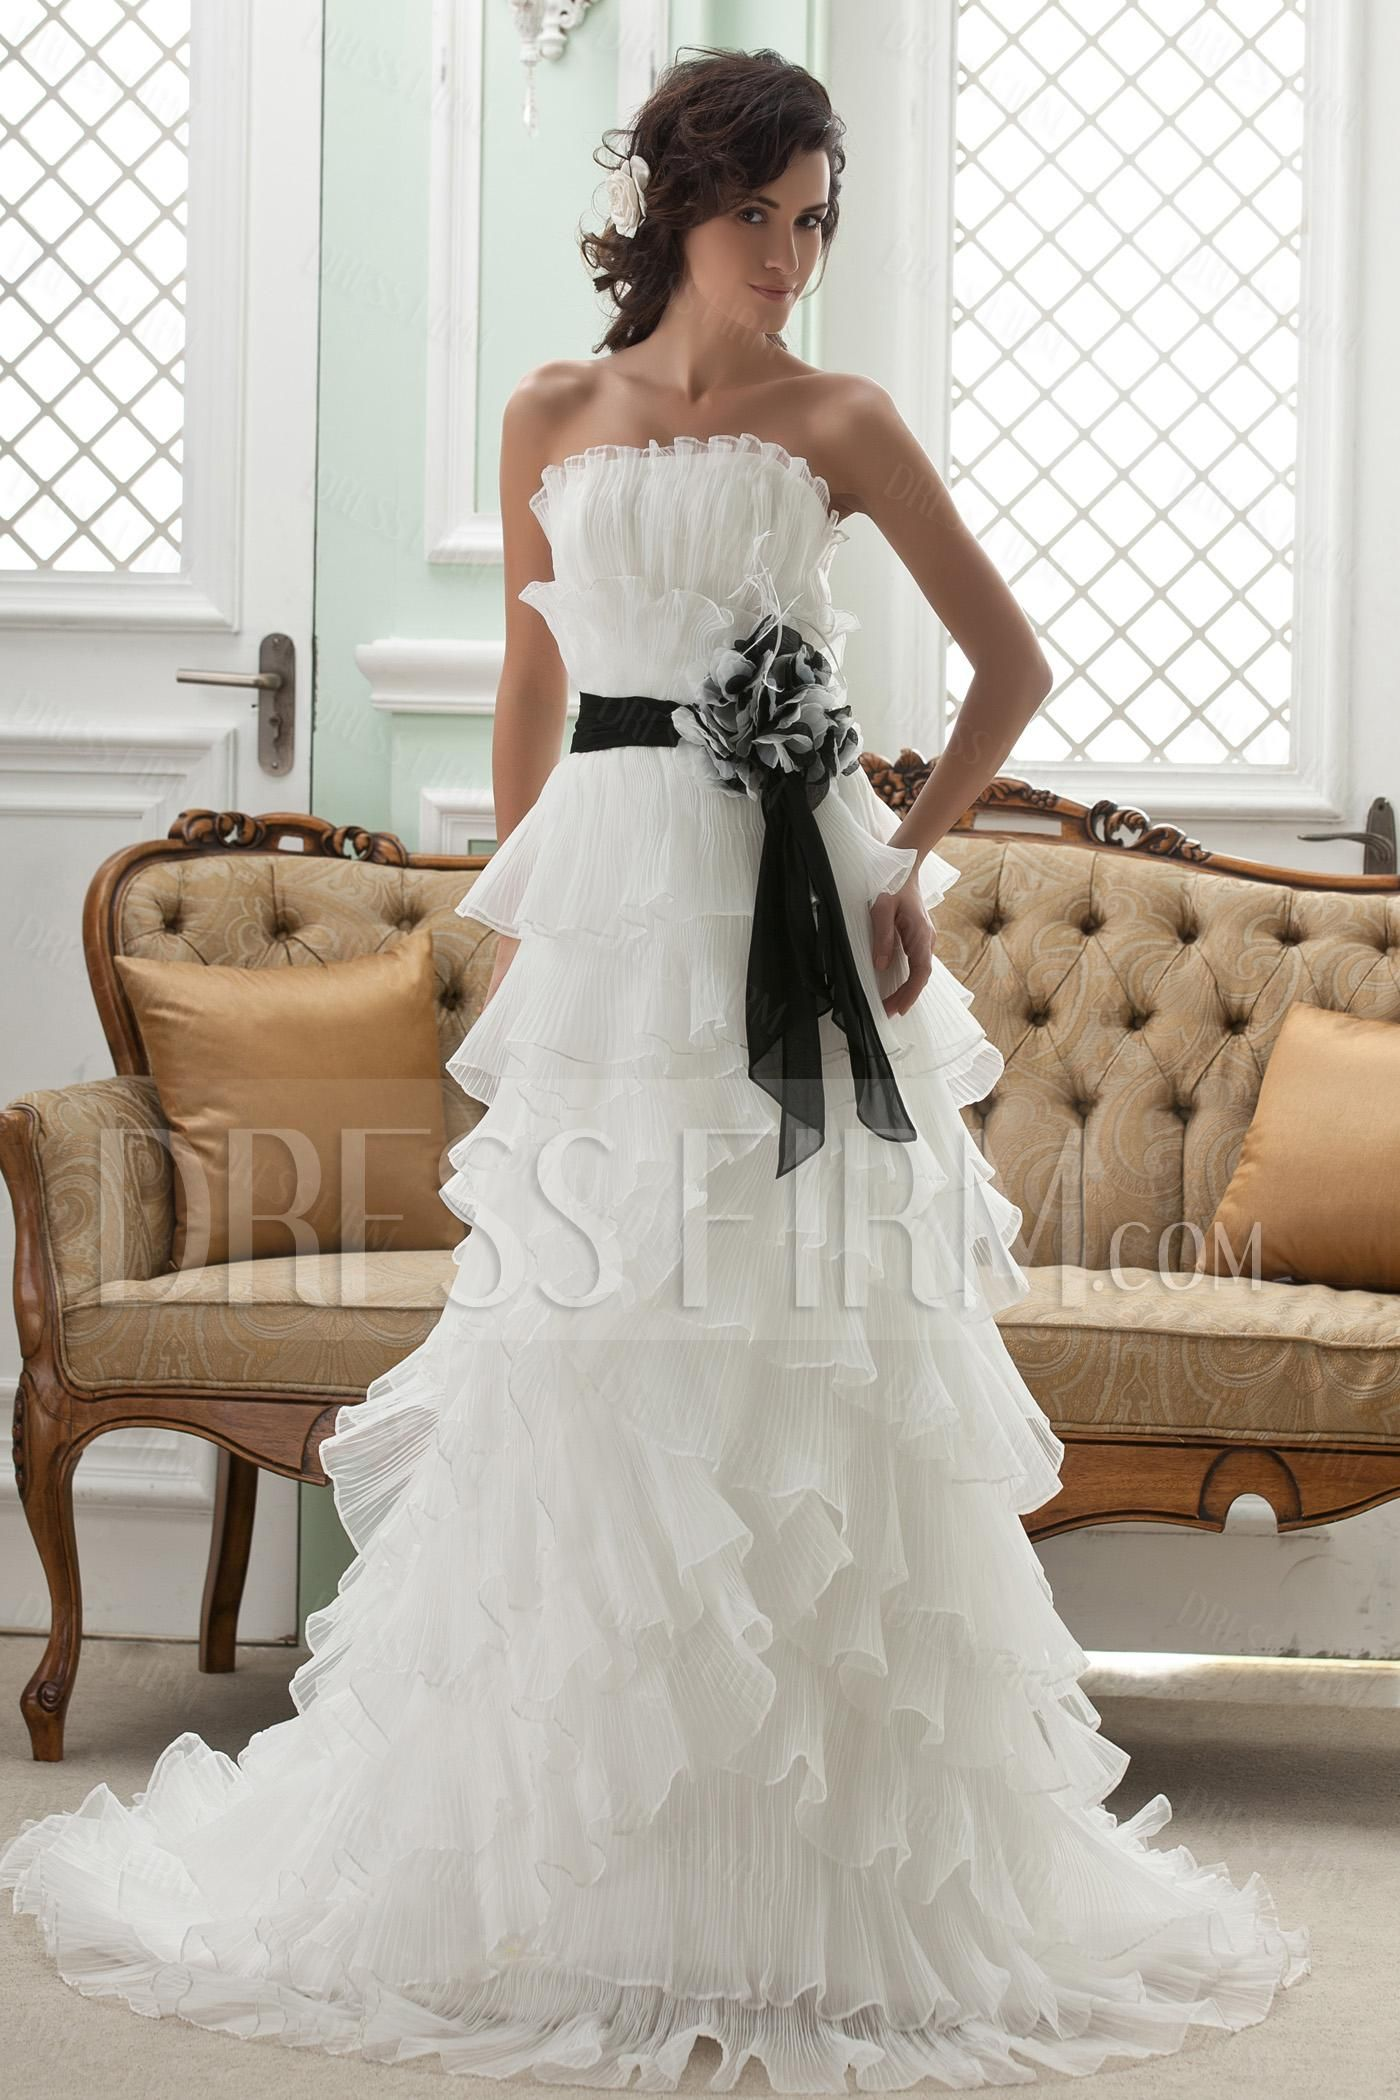 Amazing Empire Strapless Sleeveless Court Wedding Dress